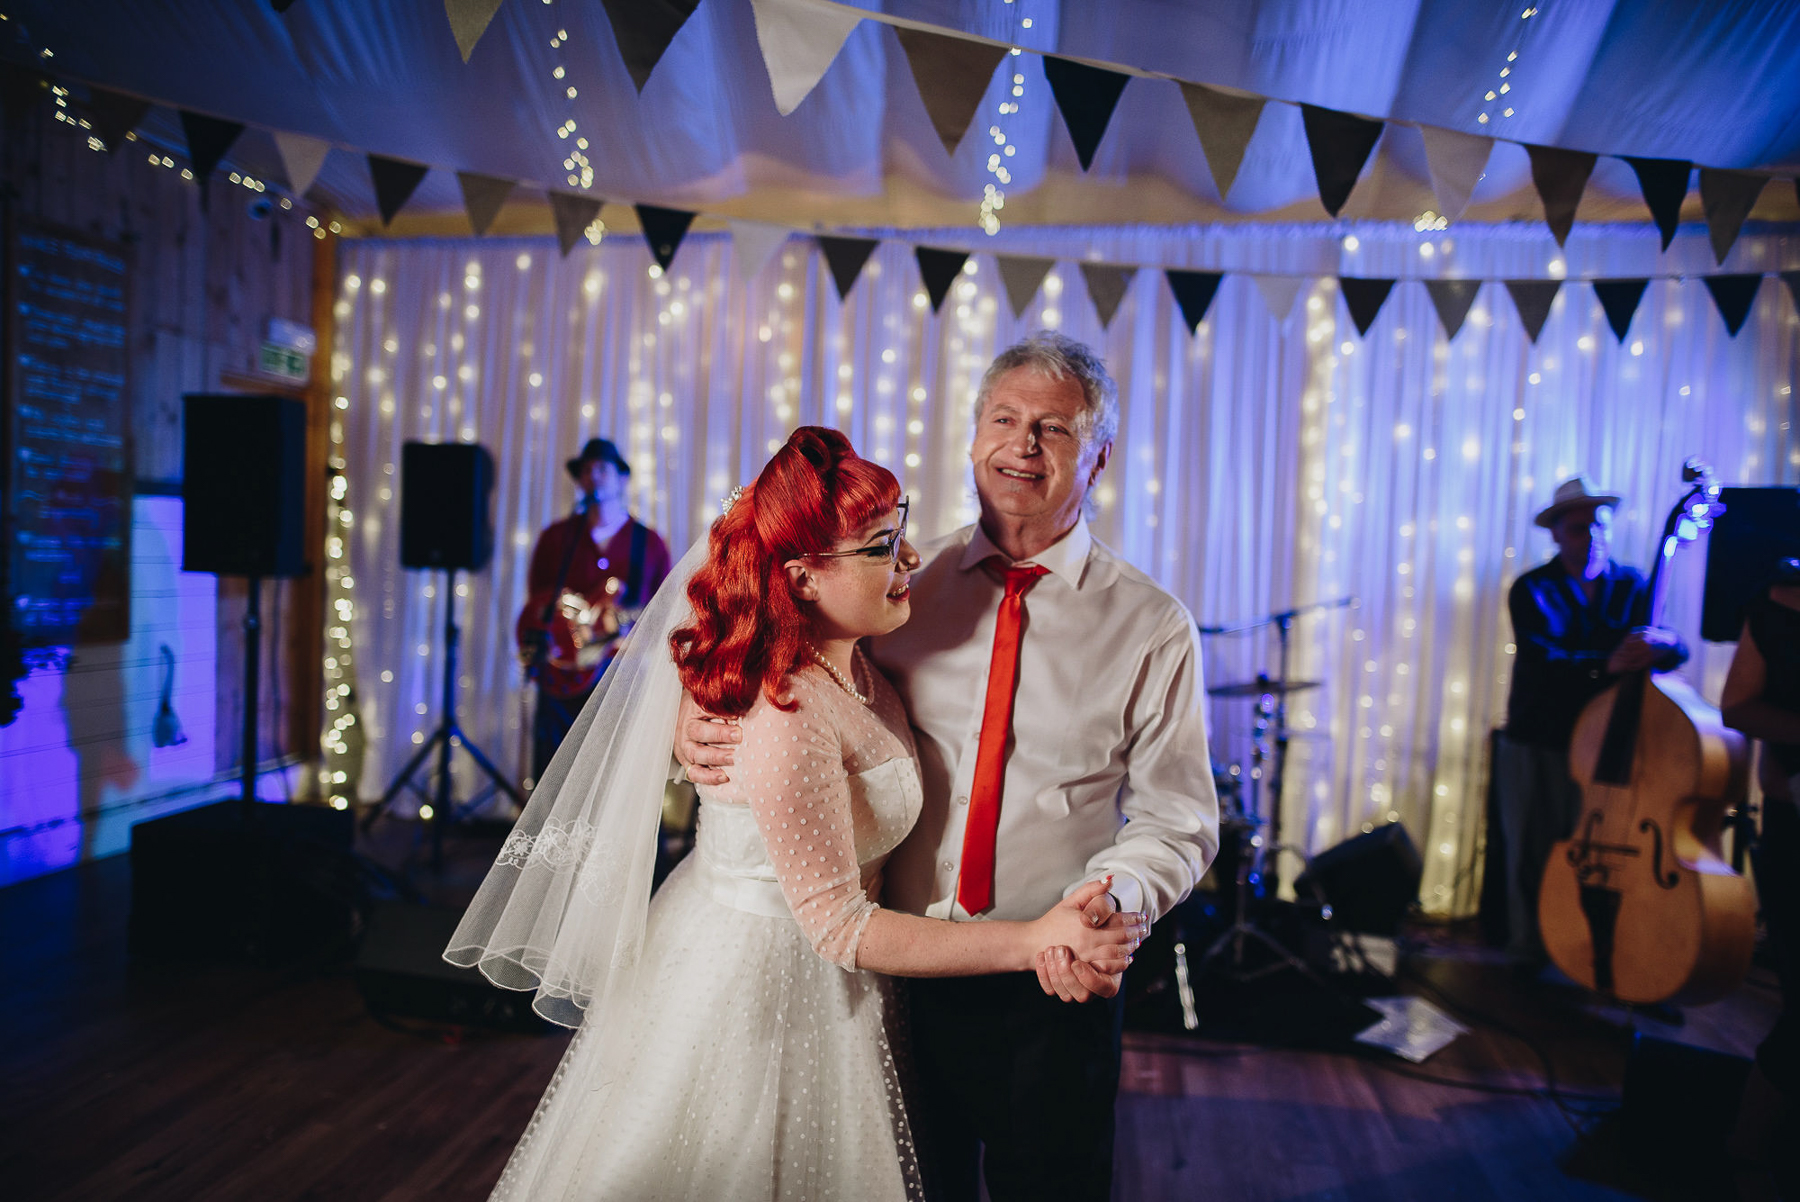 Wellbeing_Farm_Wedding_Photography_The_Pin-Up_Bride_Lara_Shaun-150.jpg